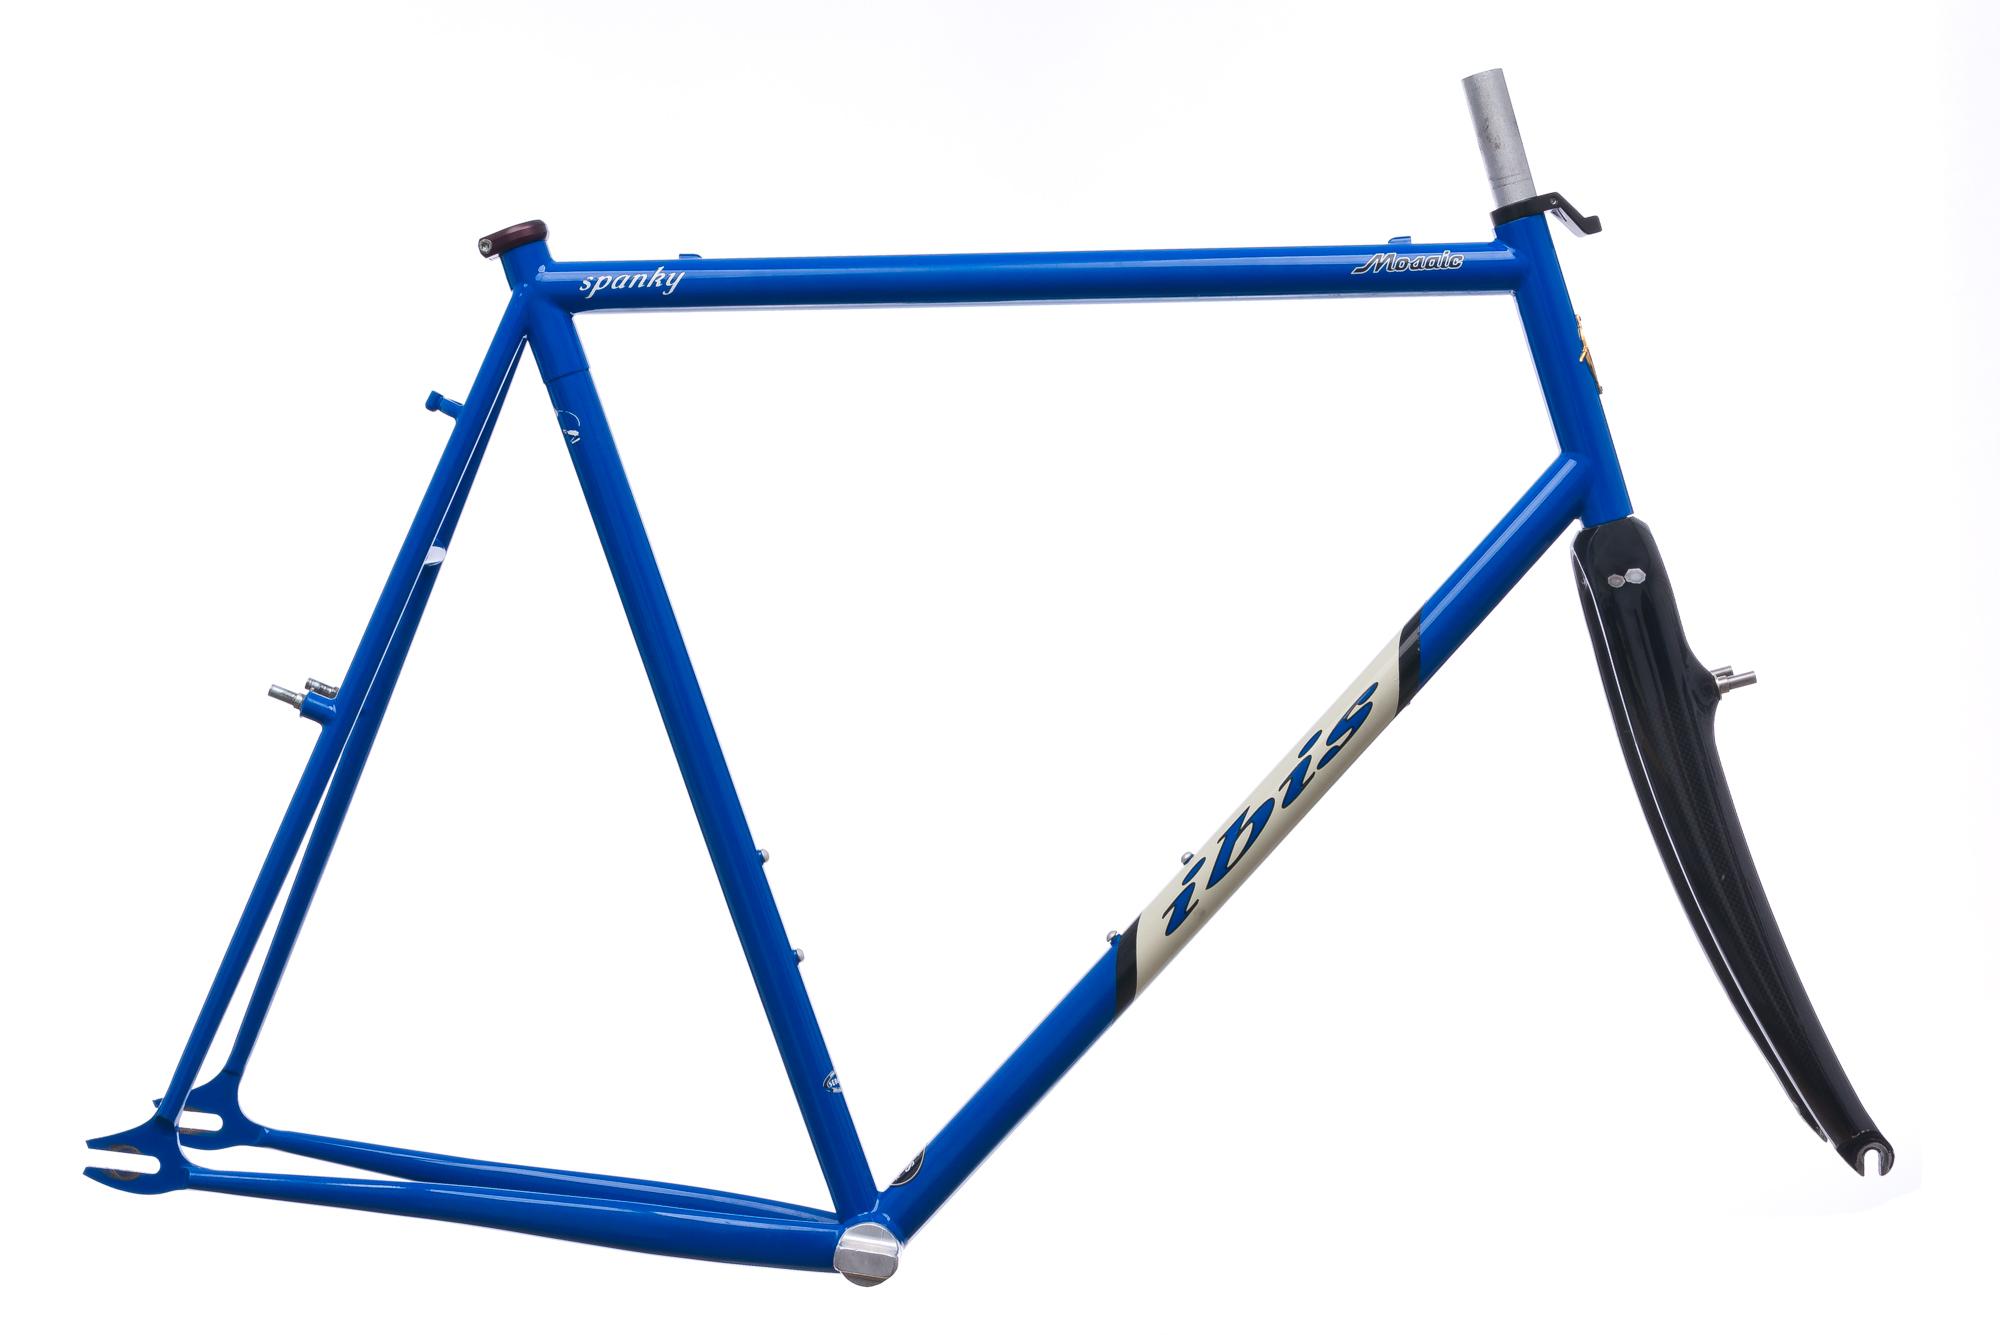 Ibis Spanky Steel Road Bike Frame Set 60cm XL Cantilever 700c | eBay